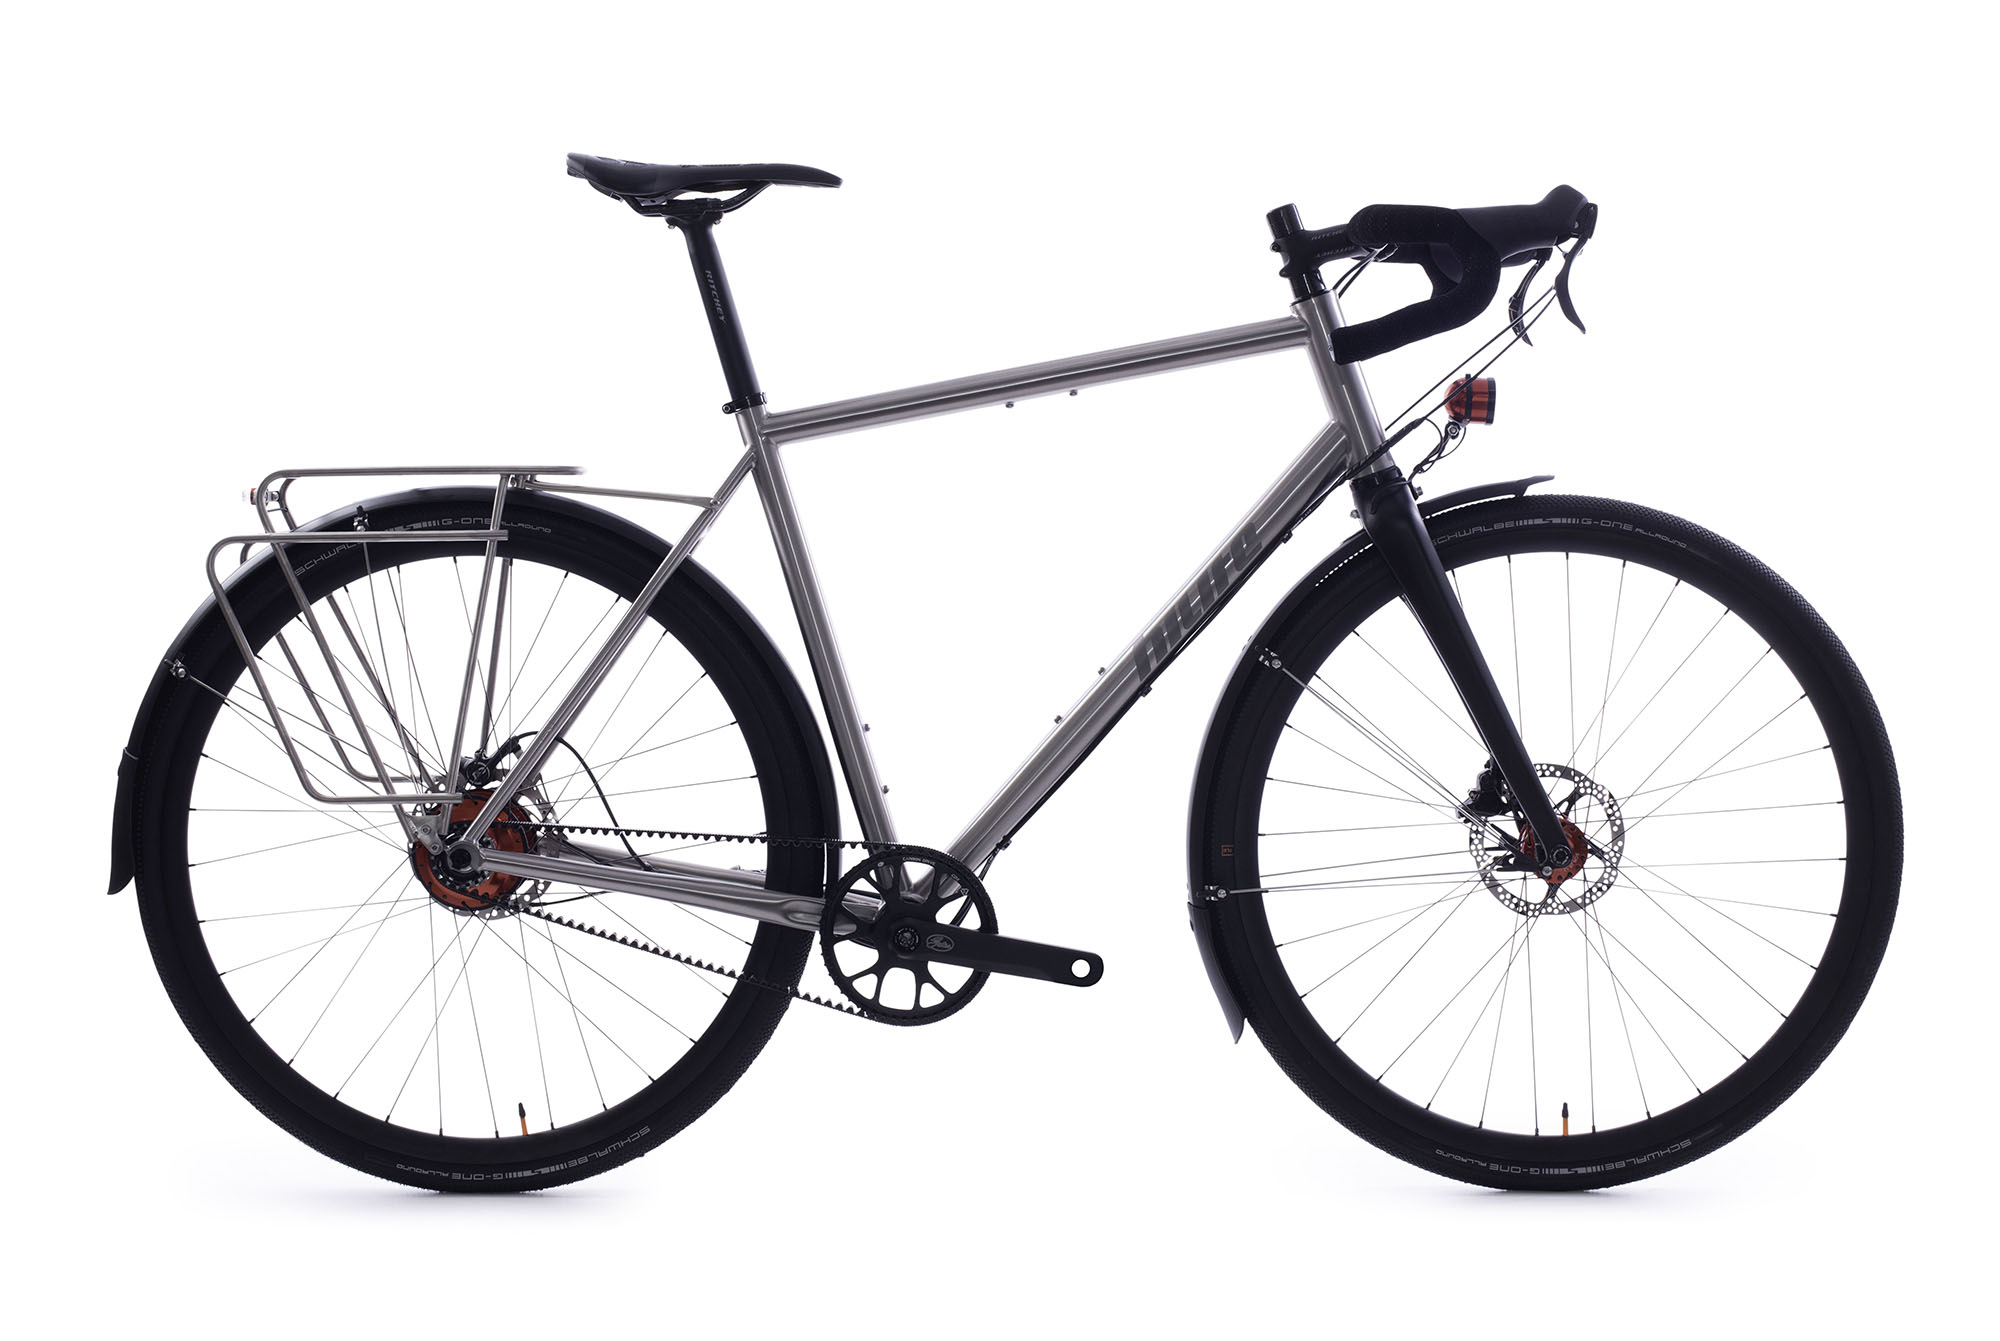 Francis' Titan Rohloff Gravel Bike